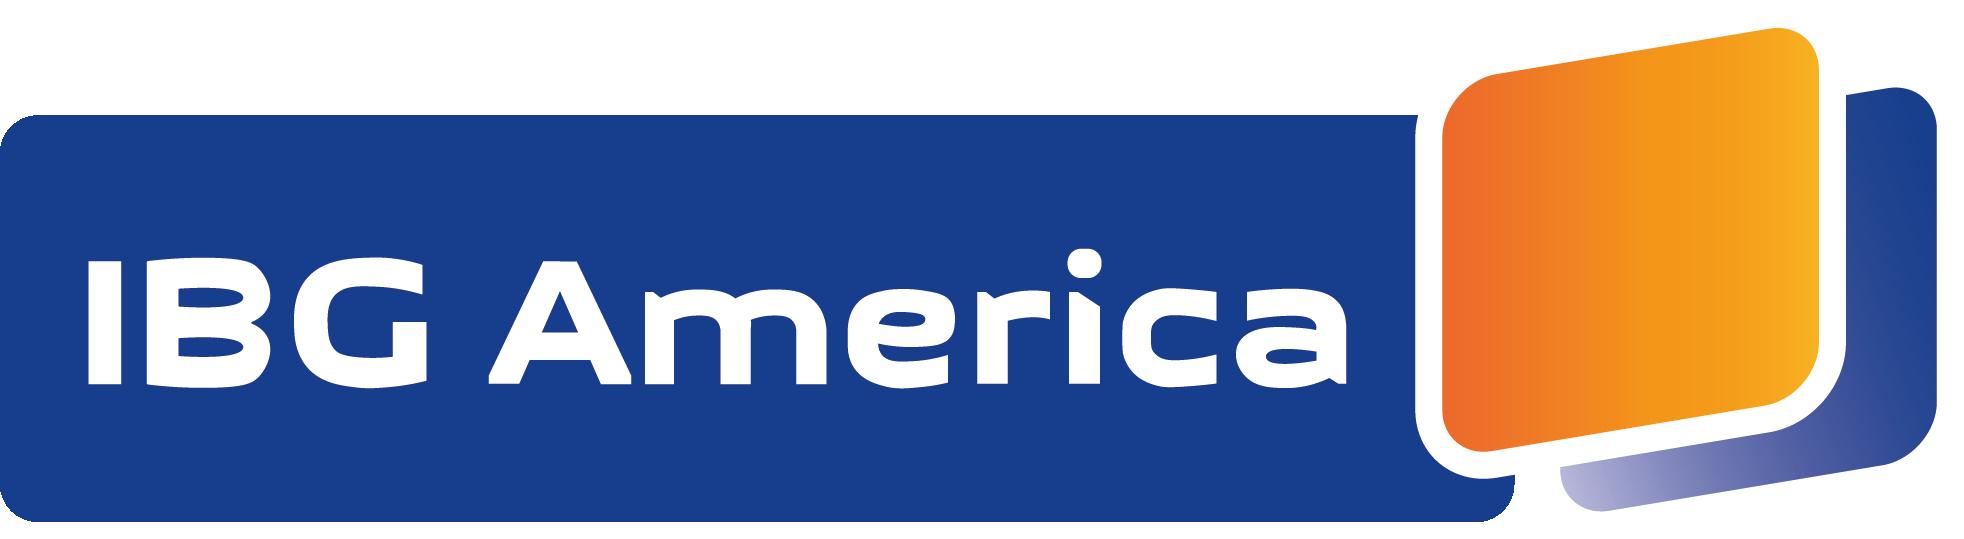 IBG America